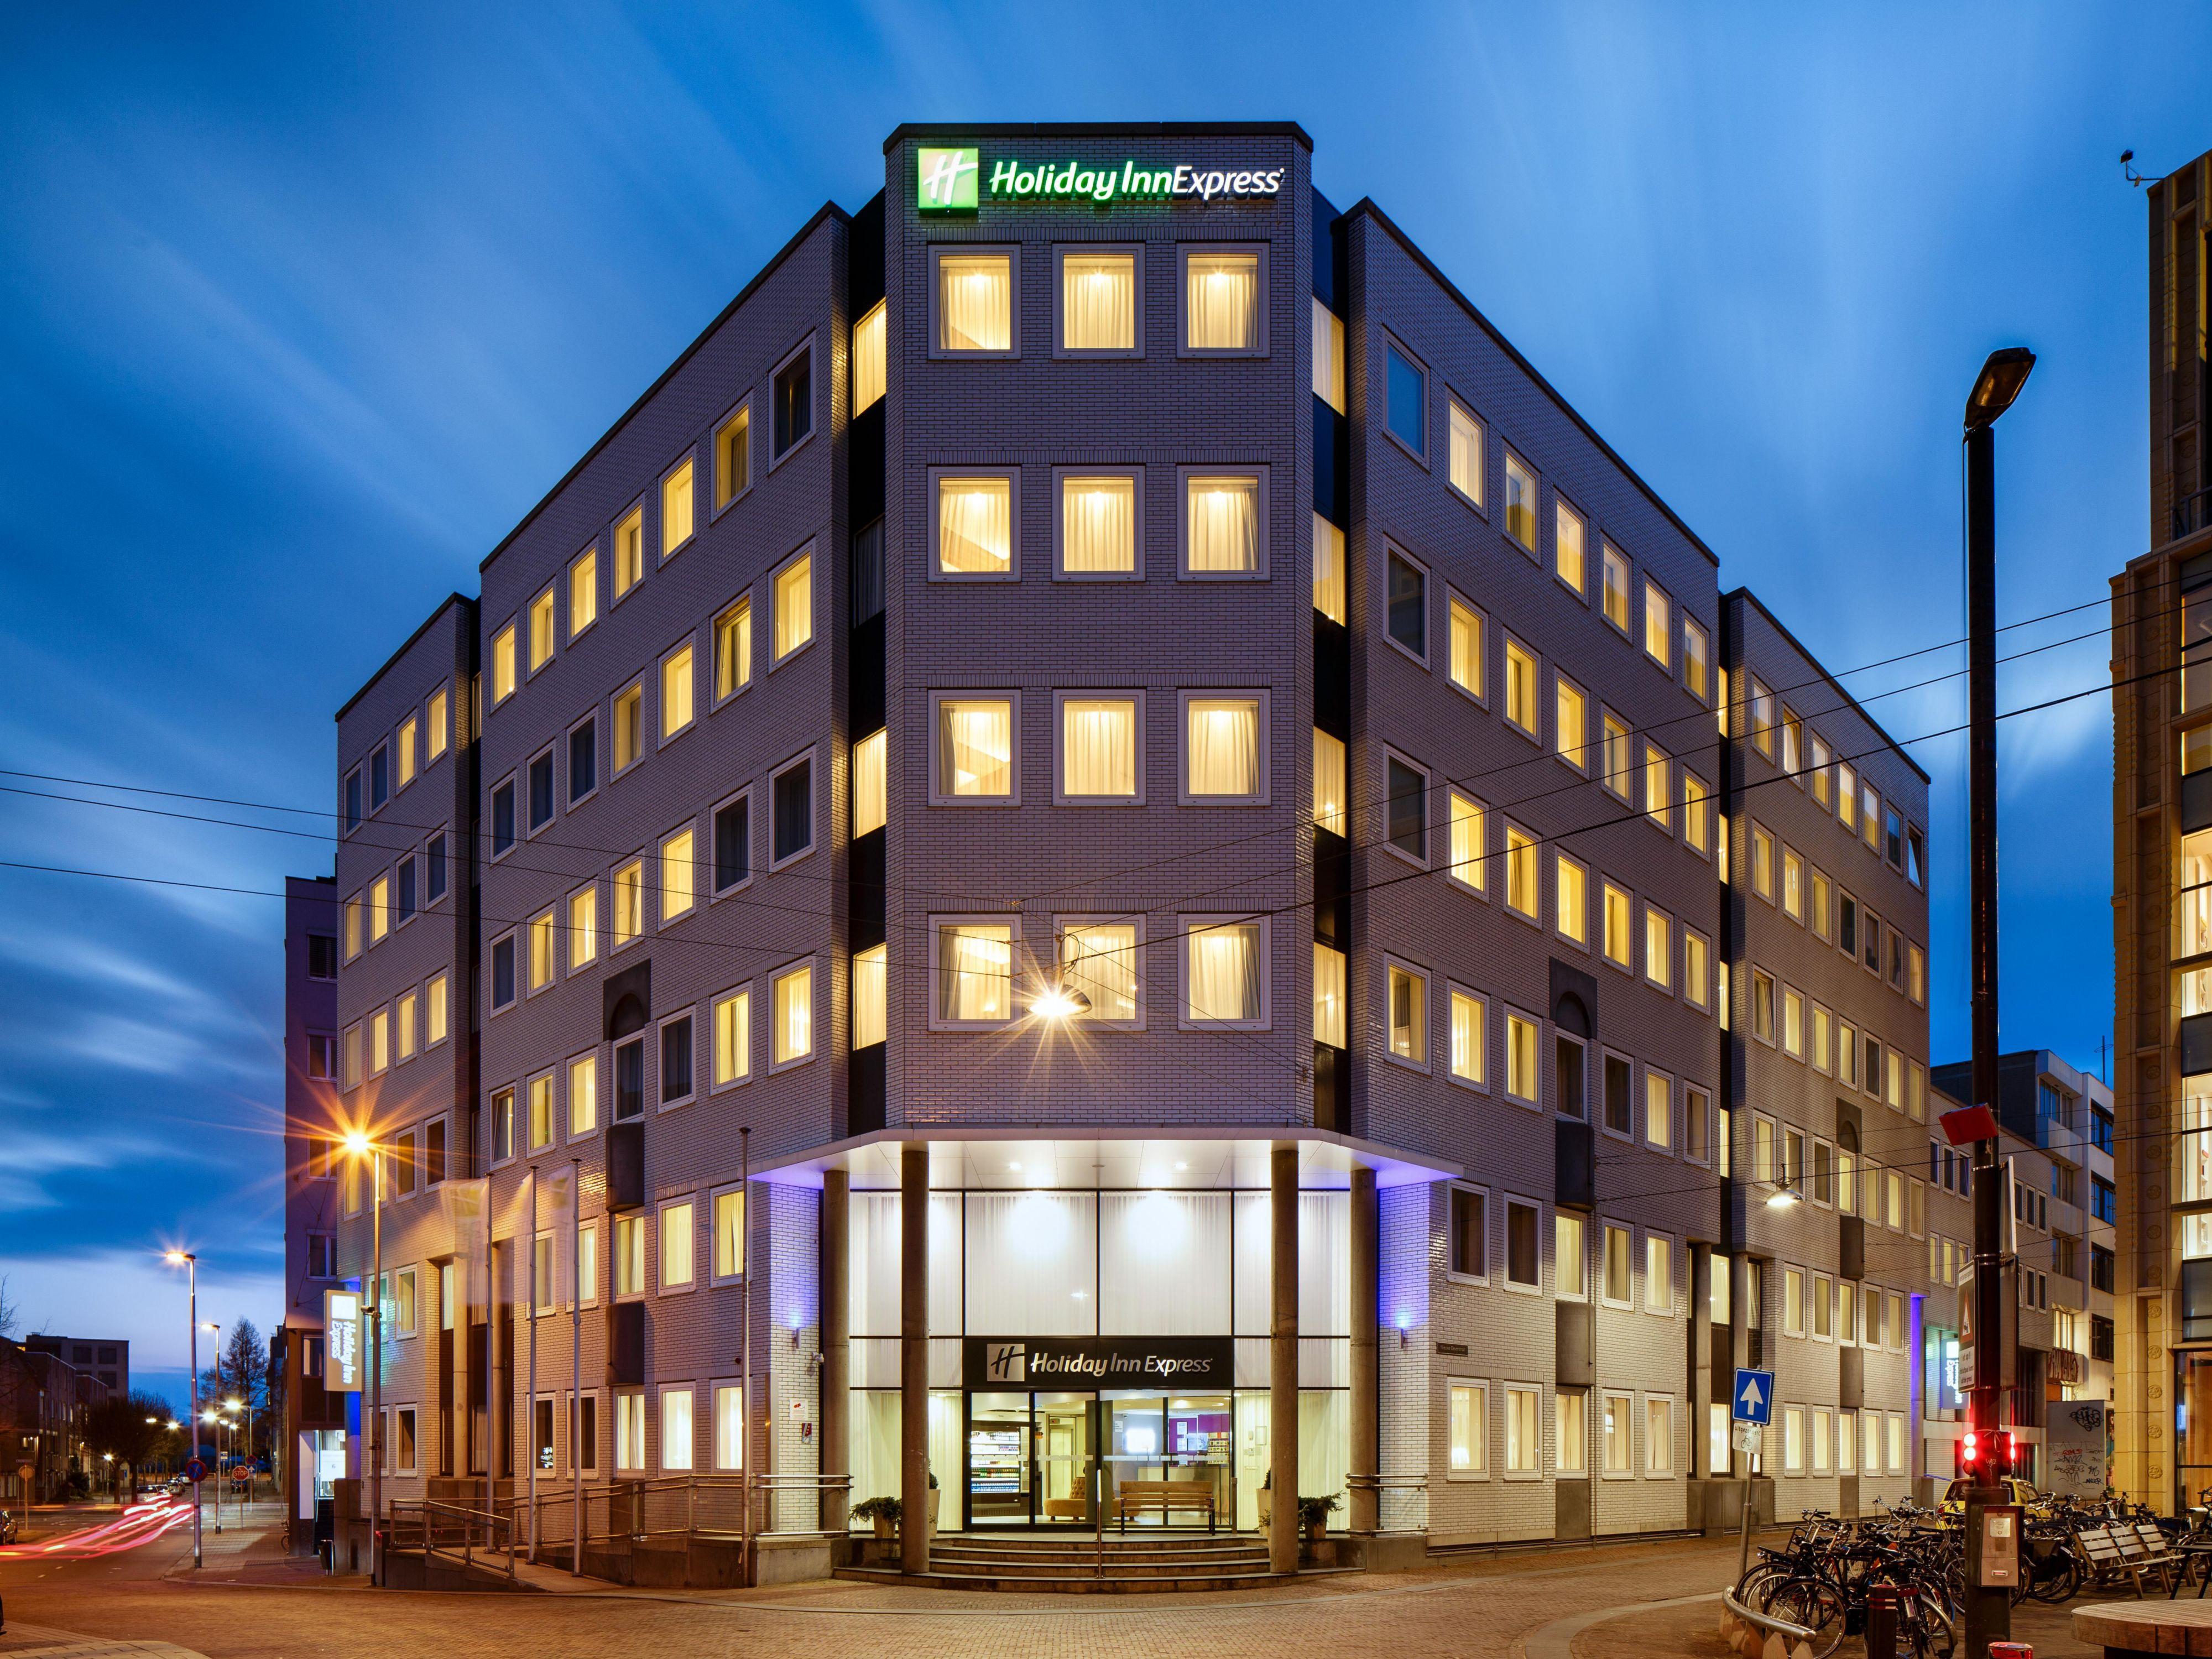 Arnhem Hotel  Holiday Inn Express Arnhem  Netherlands